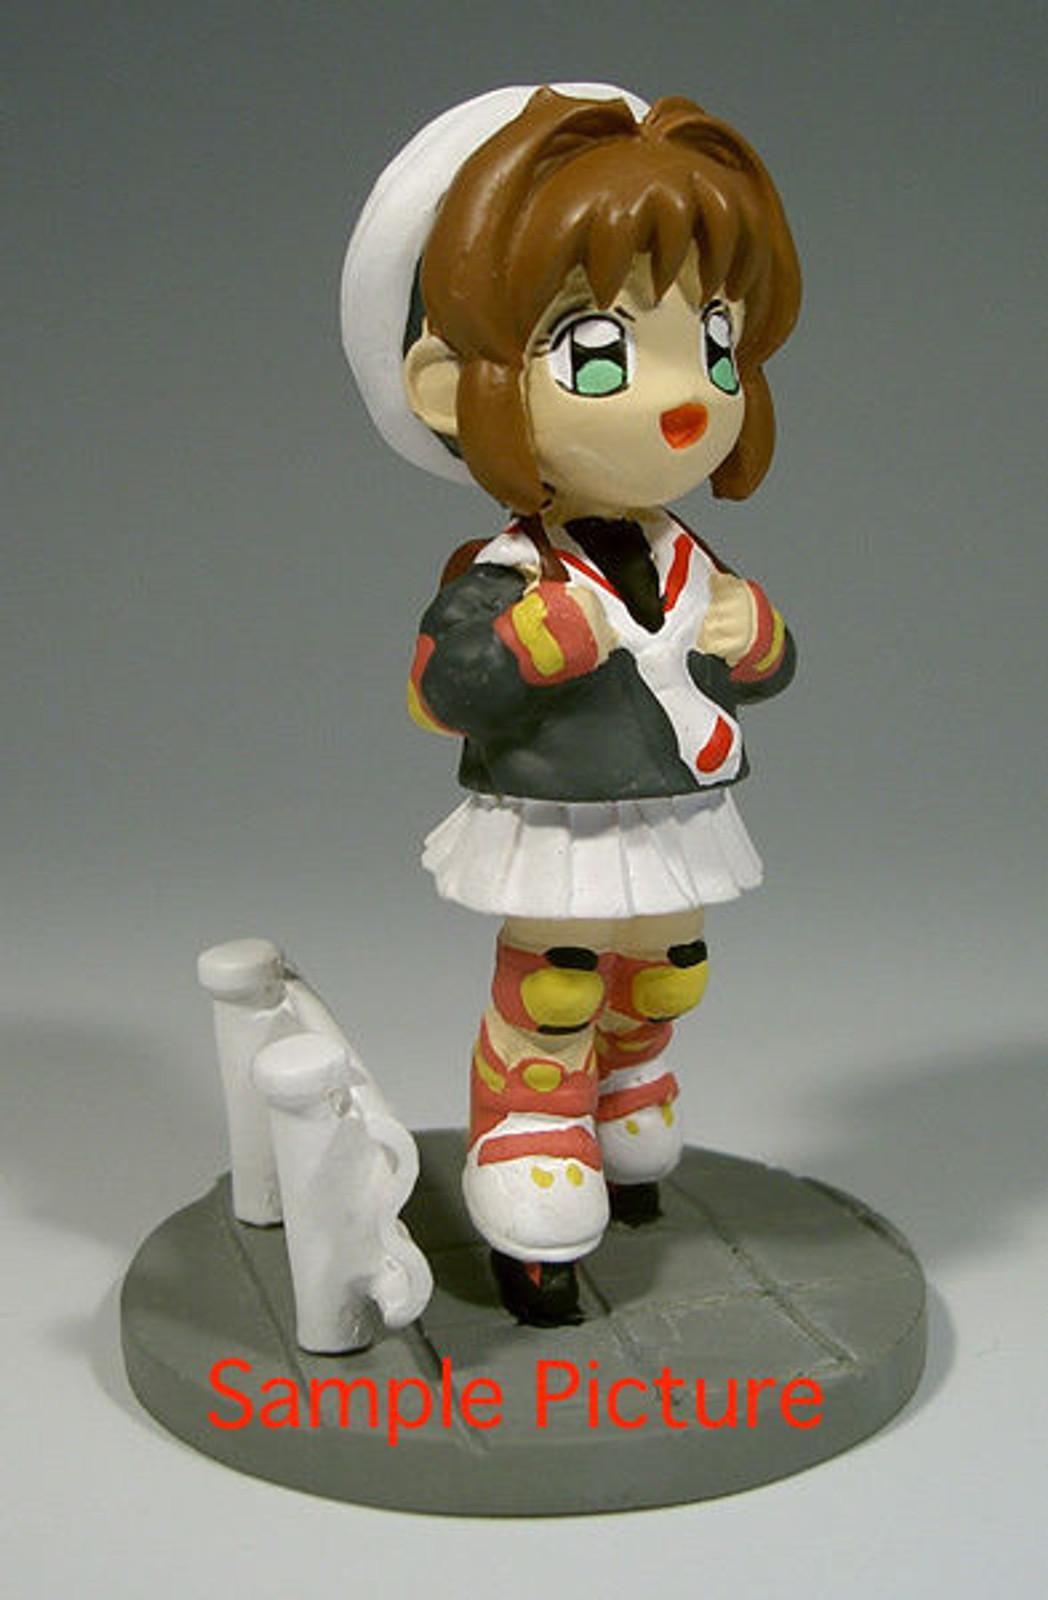 Cardcaptor Sakura Polystone Figure School Uniform Ver. CLAMP JAPAN ANIME MANGA